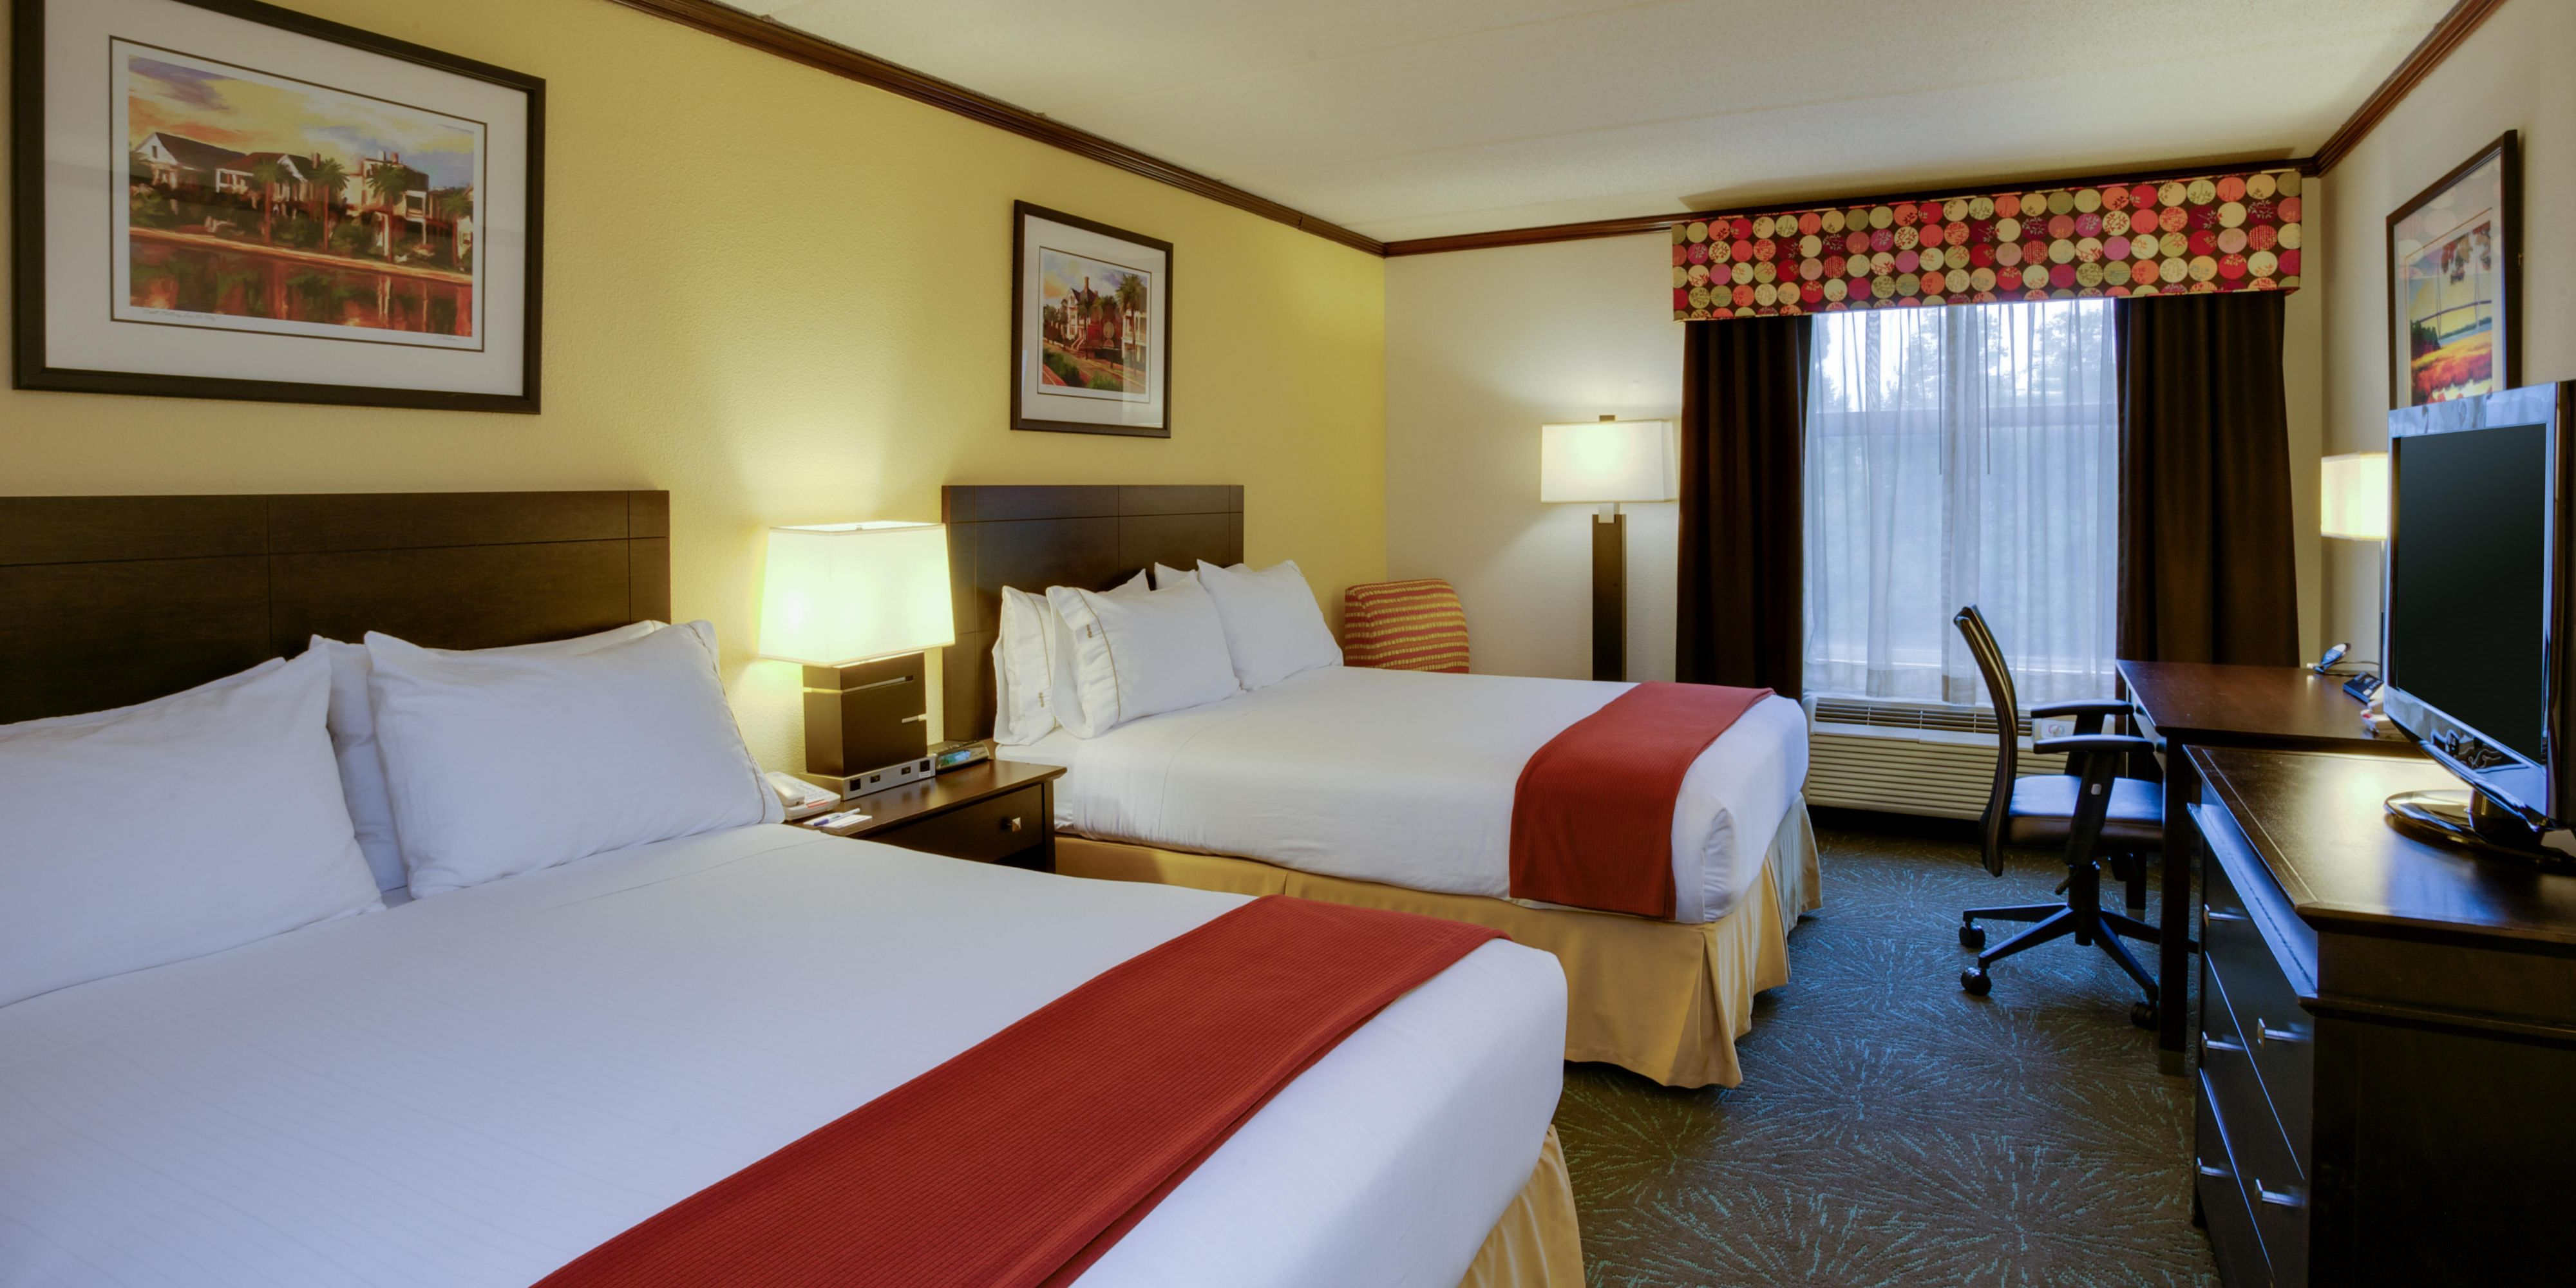 2 Bedroom Hotel Suites In Charleston Sc